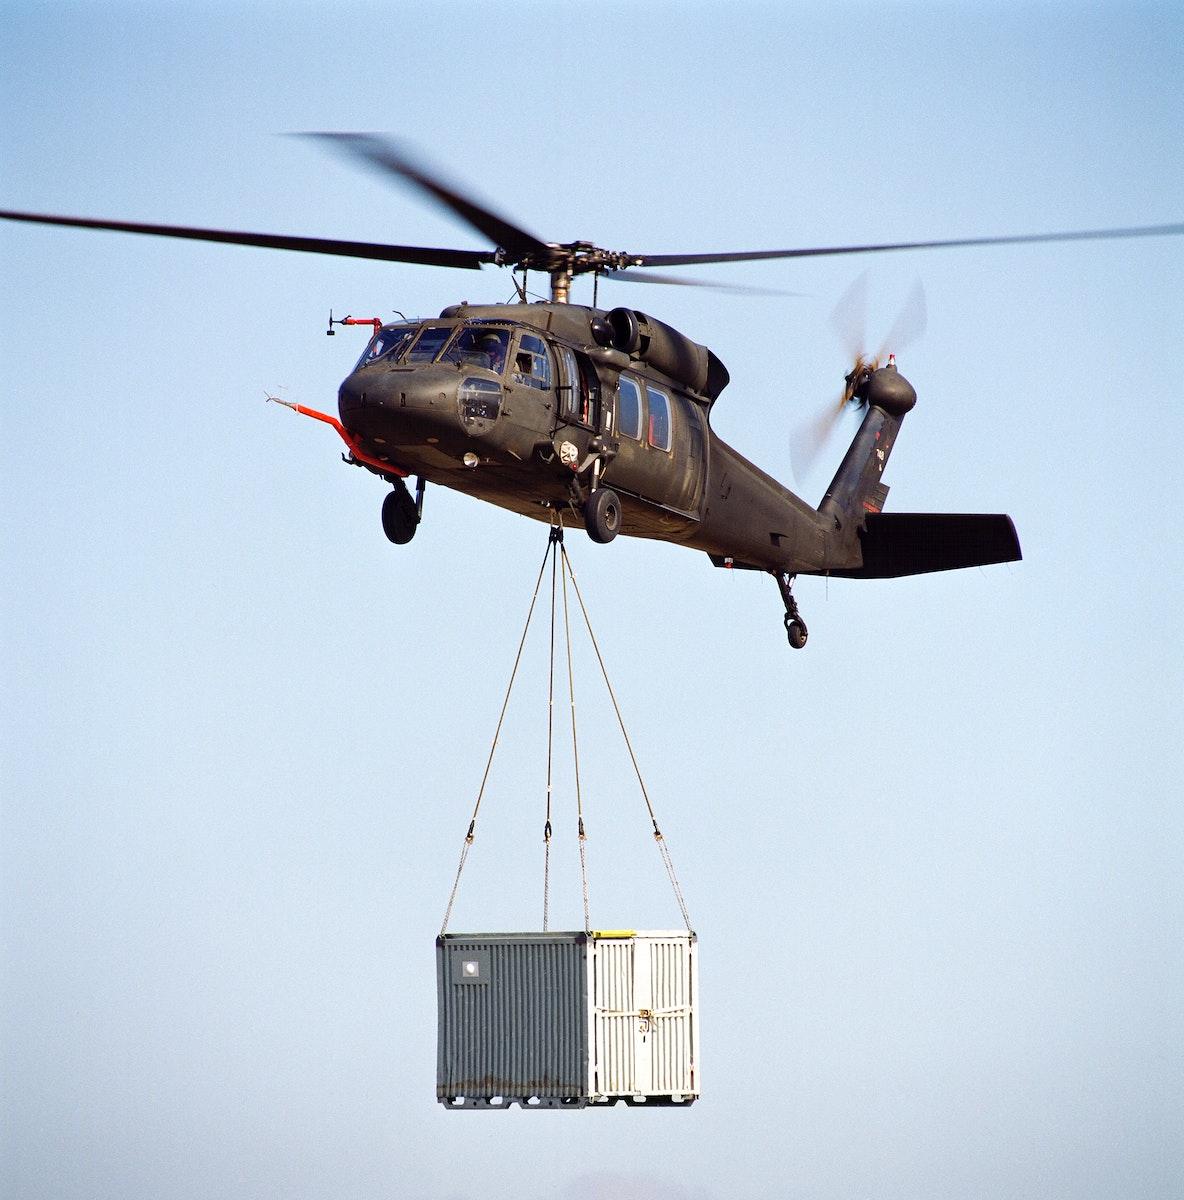 UH-60 (NASA-748) Sling Load Test for Dynamic Response. Original from NASA. Digitally enhanced by rawpixel.